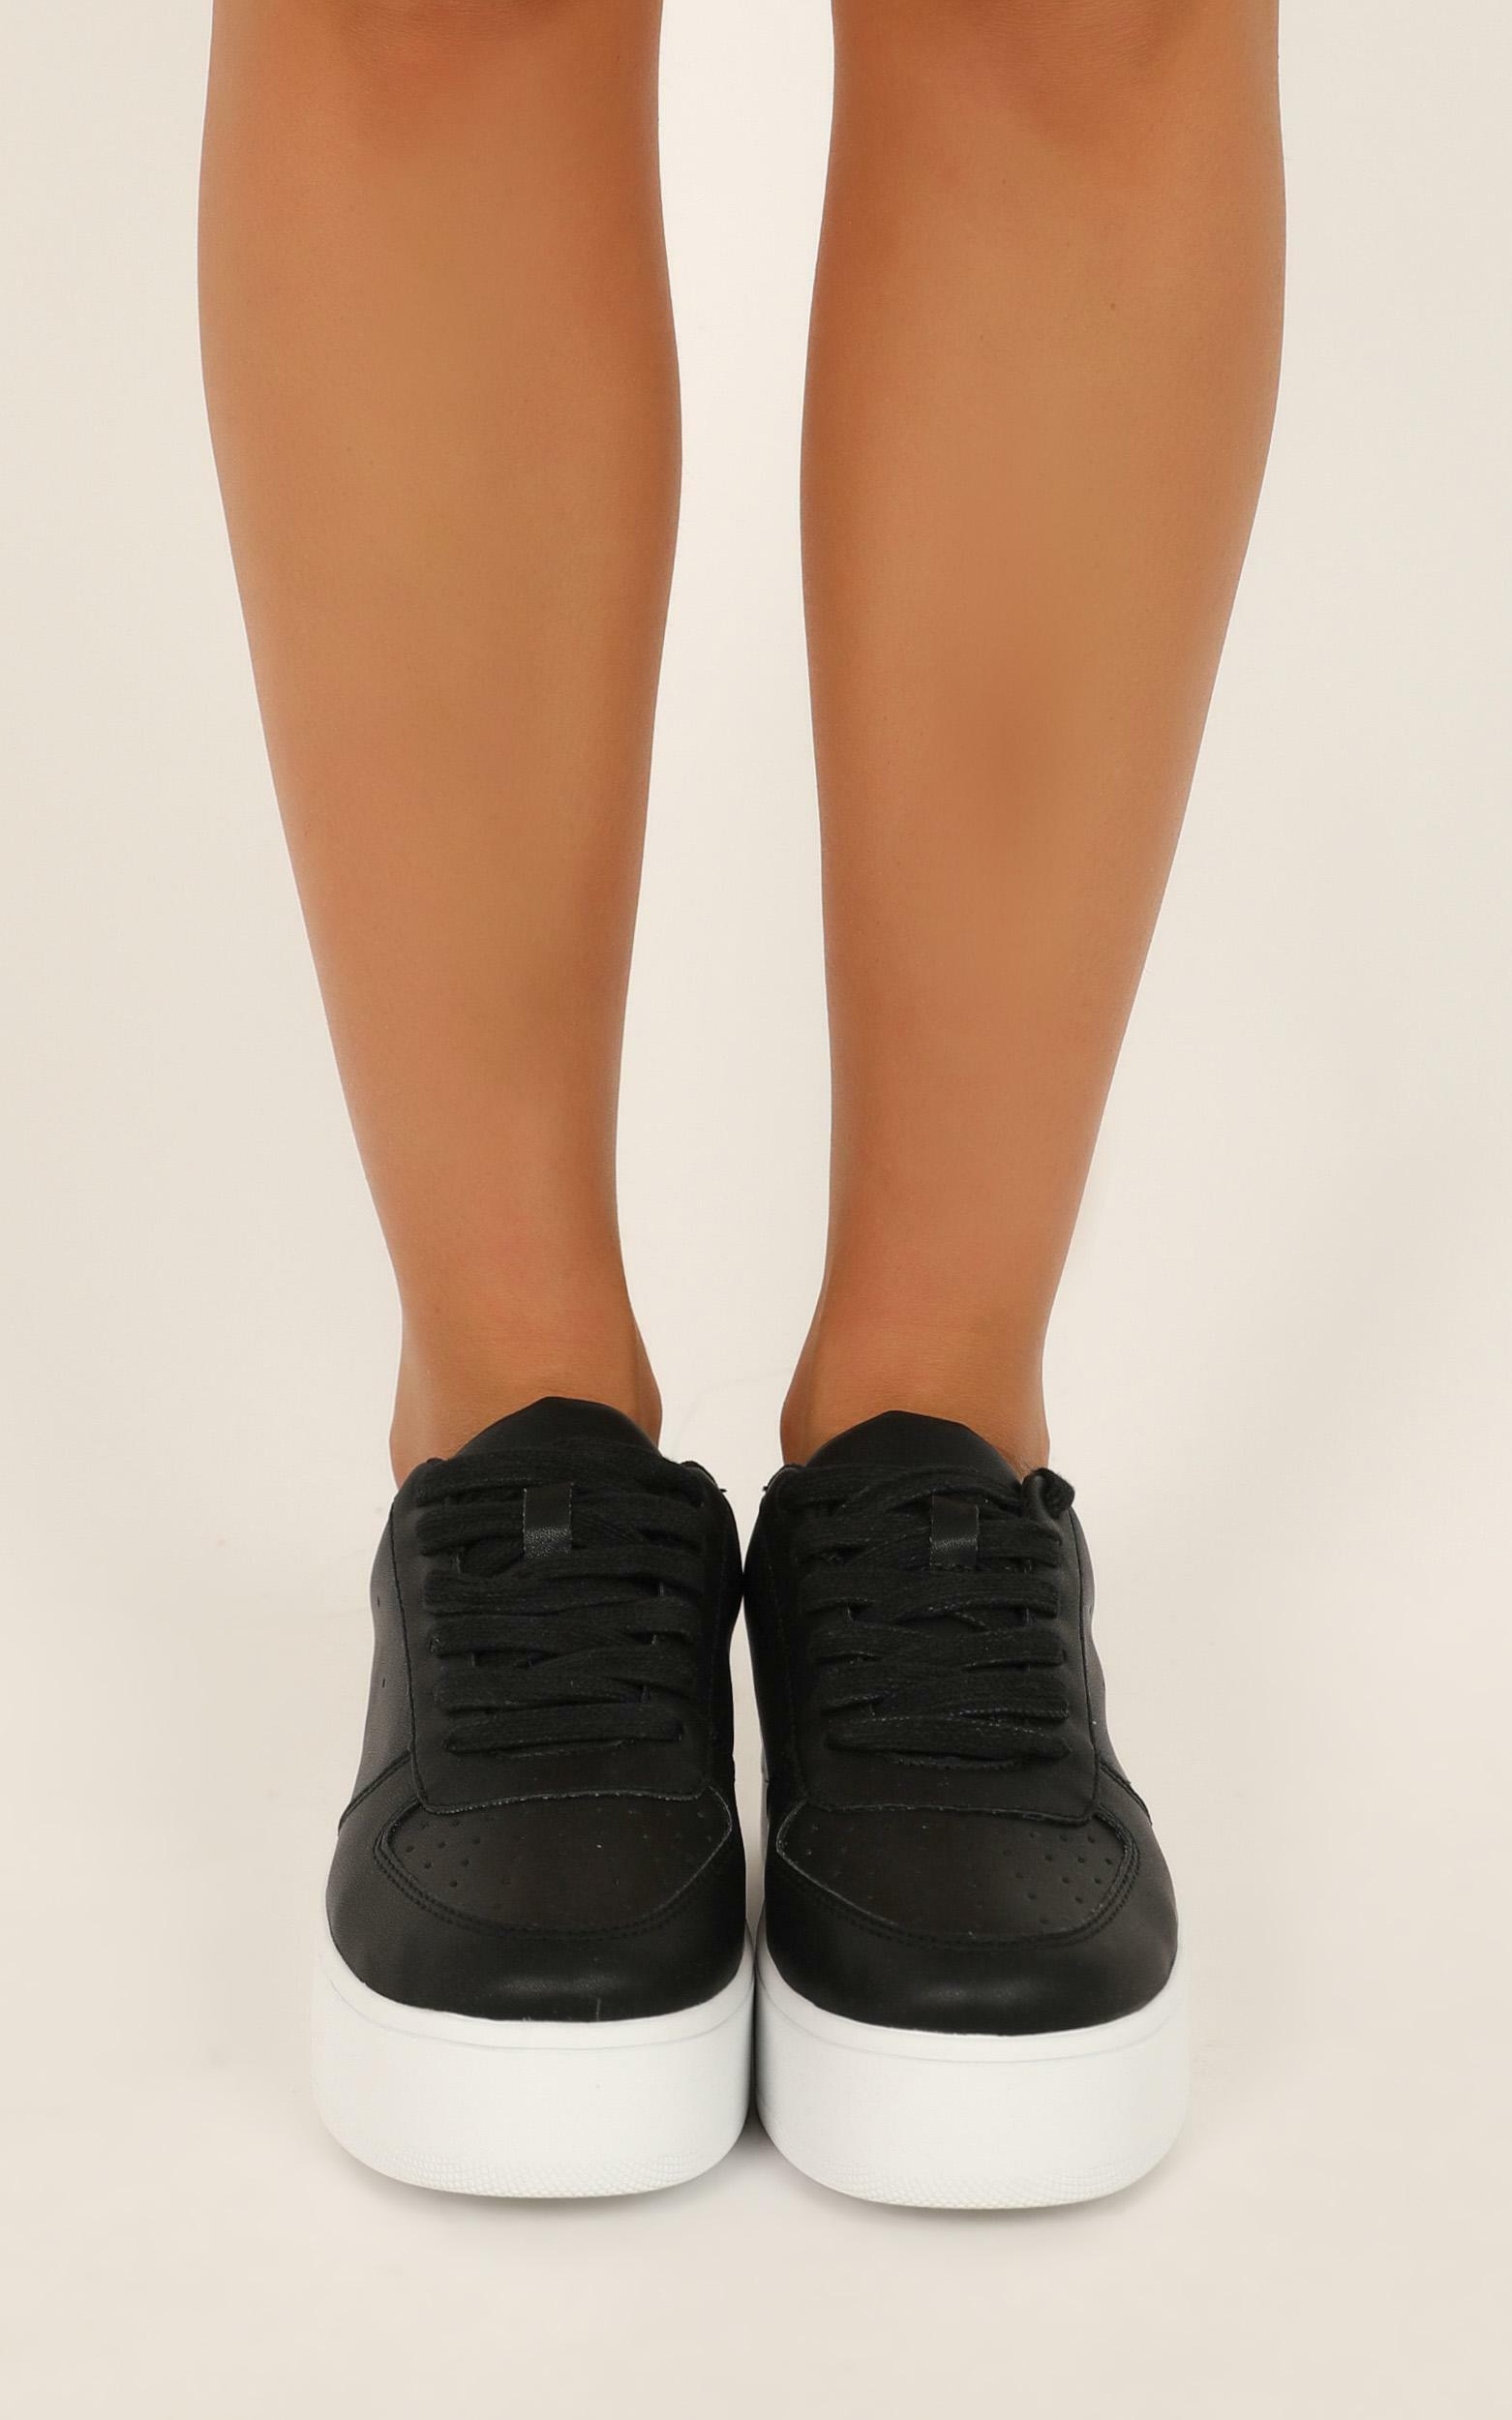 Verali - Pepper Sneakers in black smooth - 10, Black, hi-res image number null